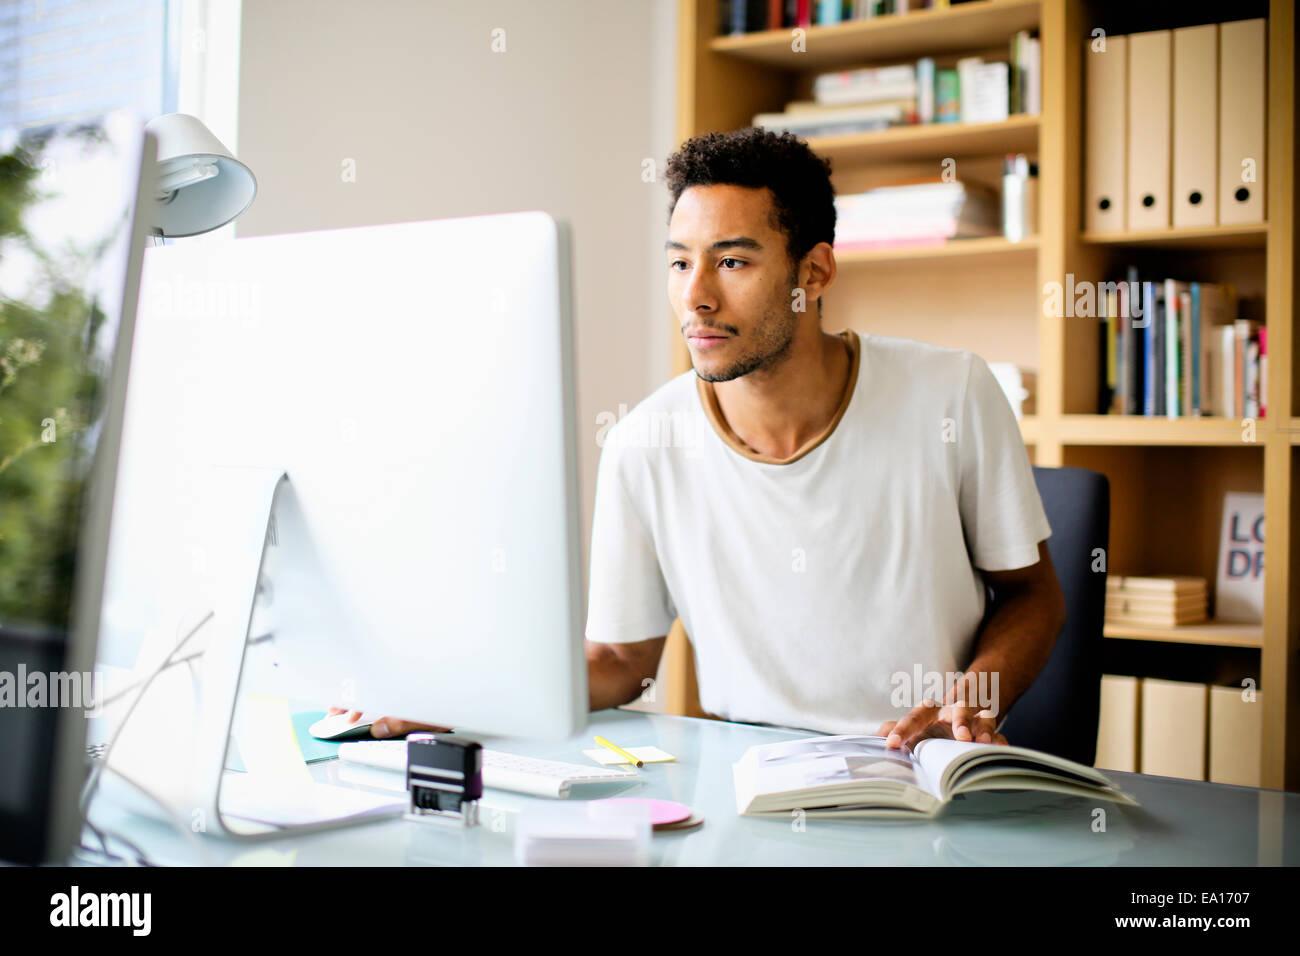 Graphic designer using computer at work - Stock Image